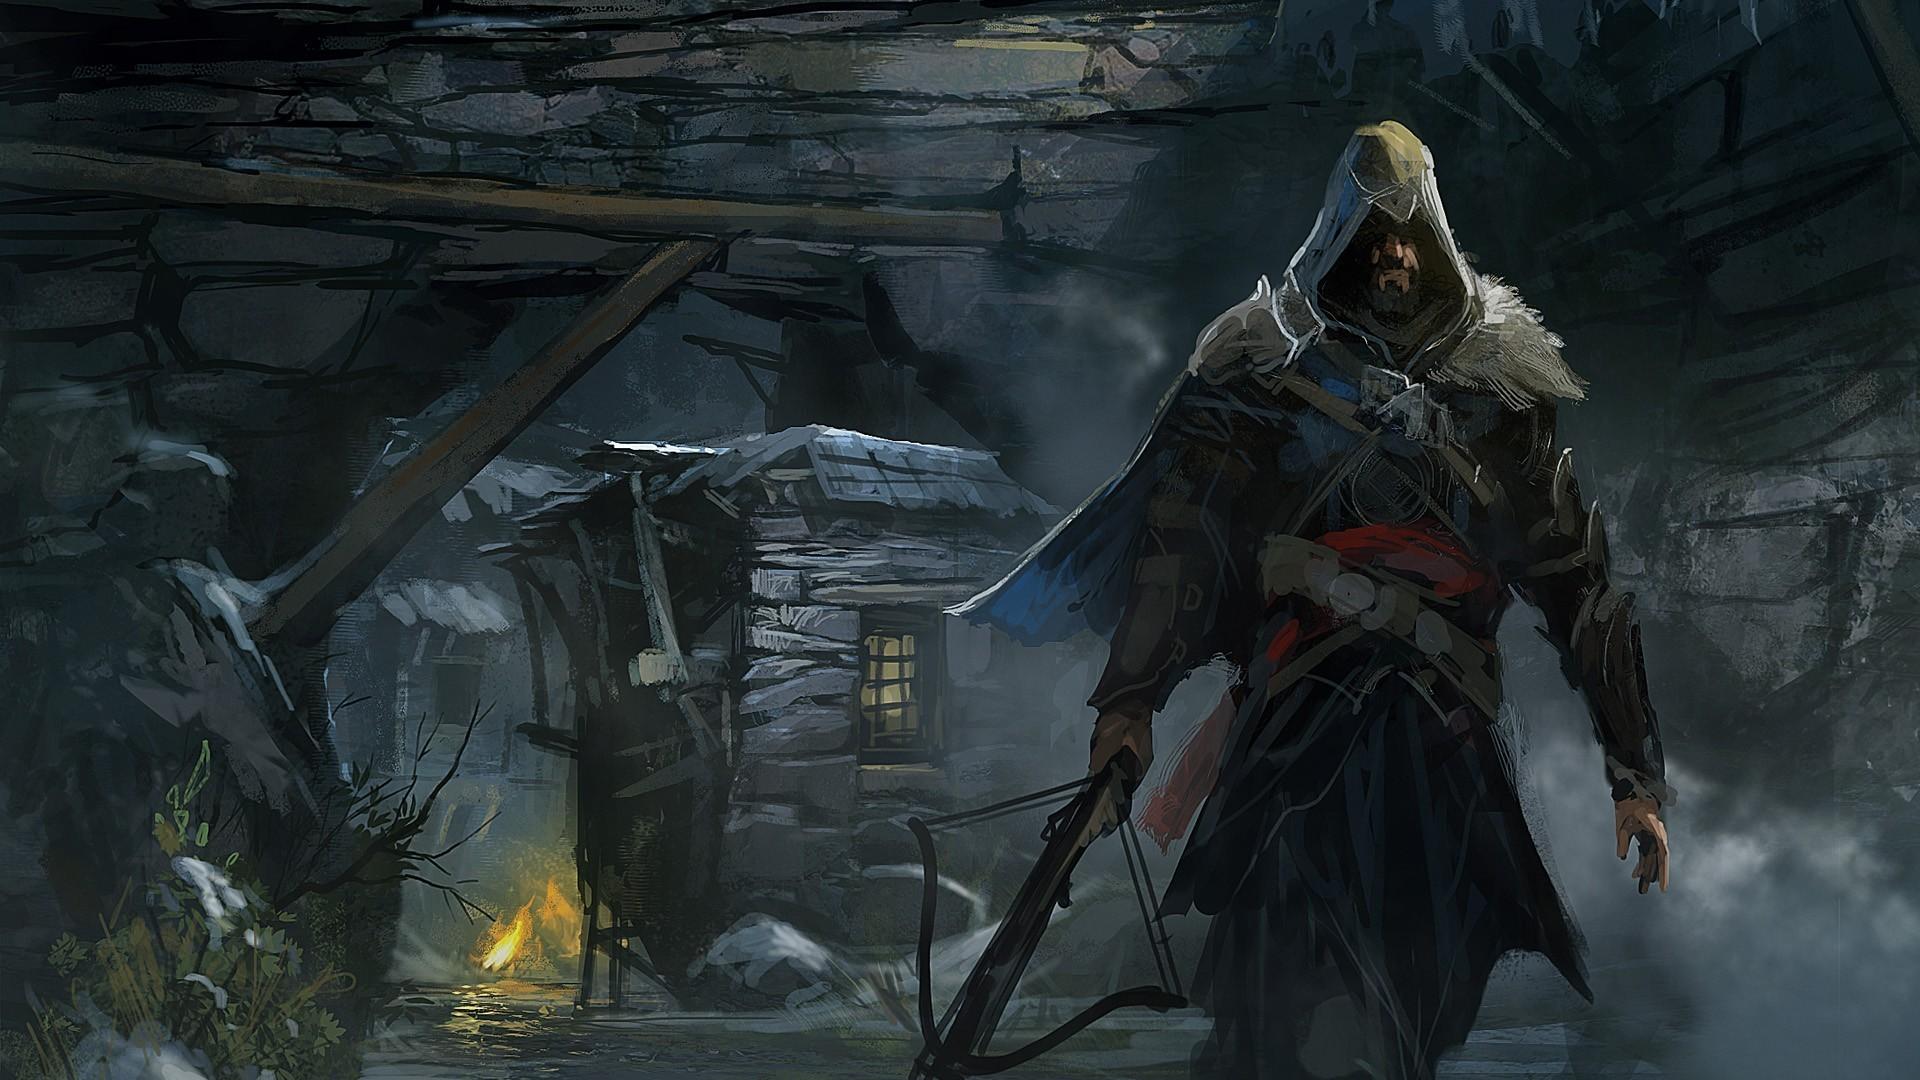 Assassins Creed: Revelations Wallpaper HD